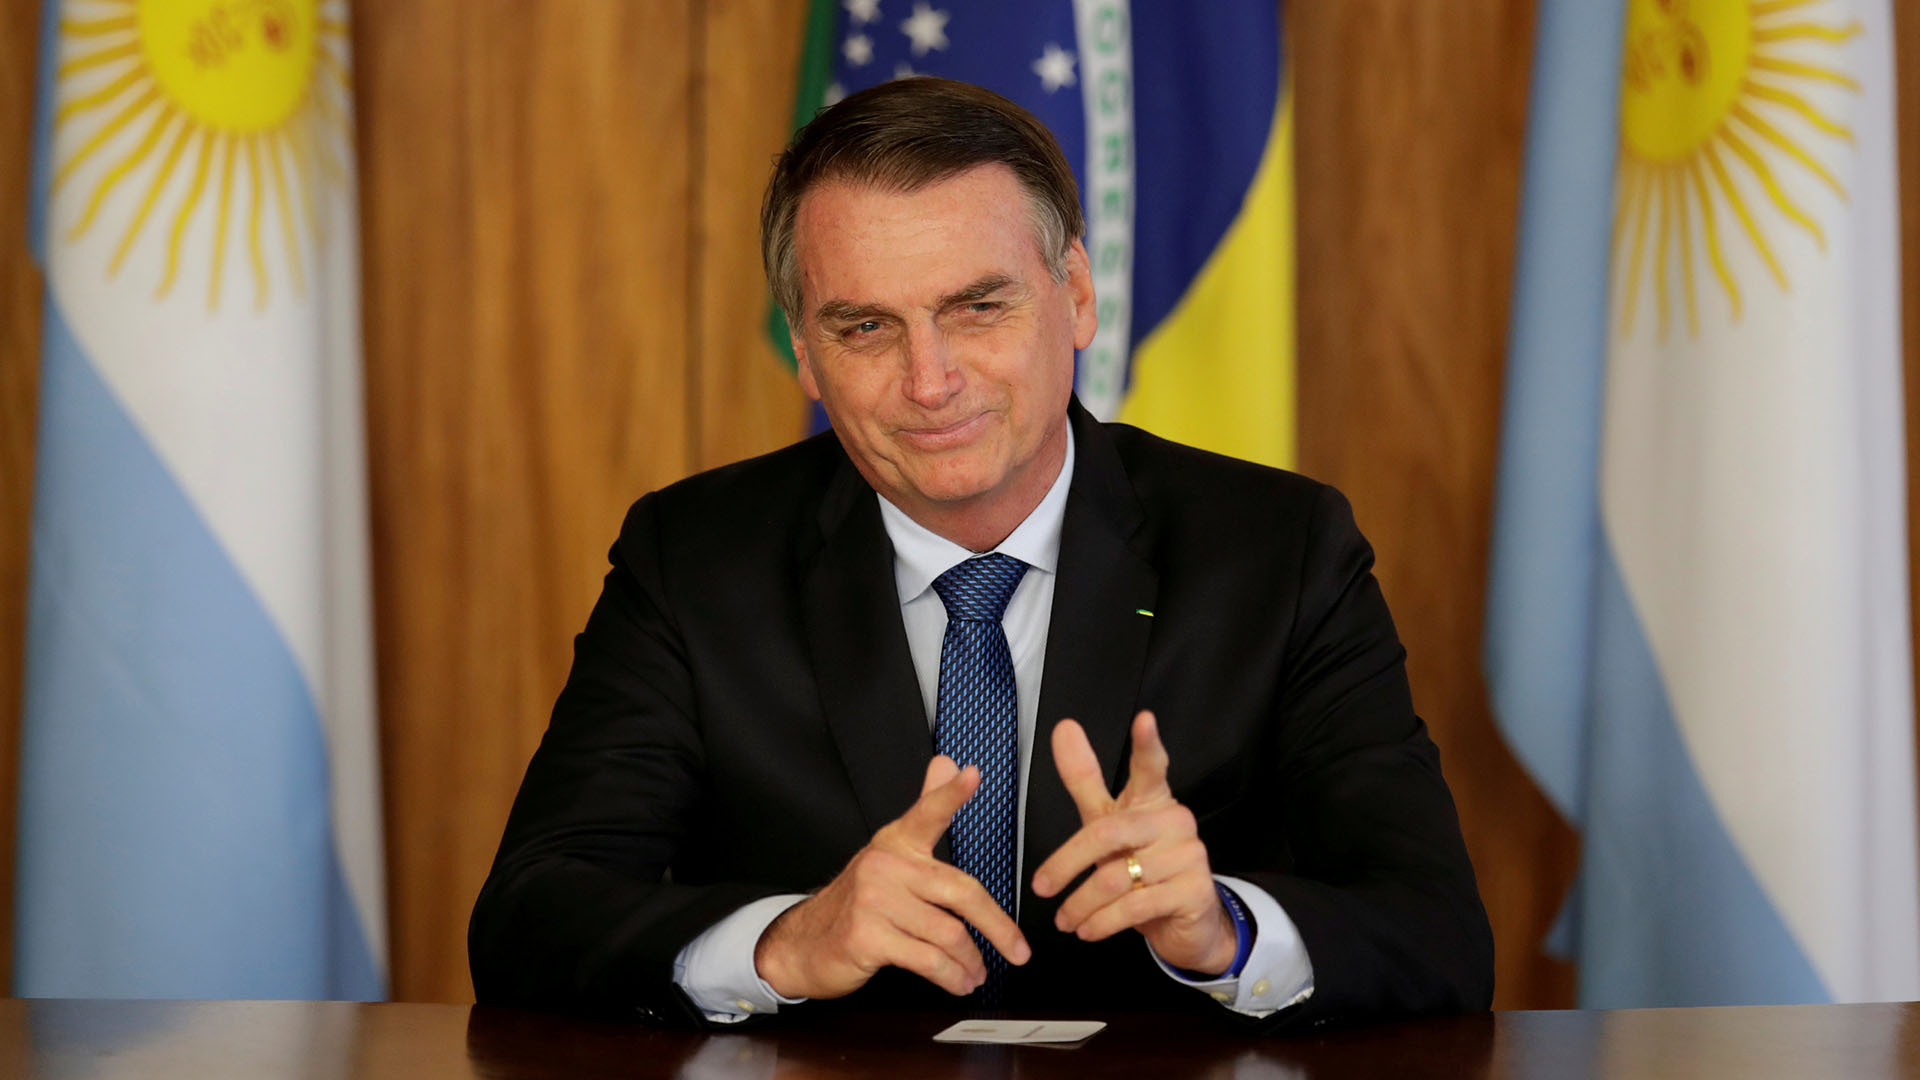 Jair Bolsonaro (REUTERS/Ueslei Marcelino/File Photo)